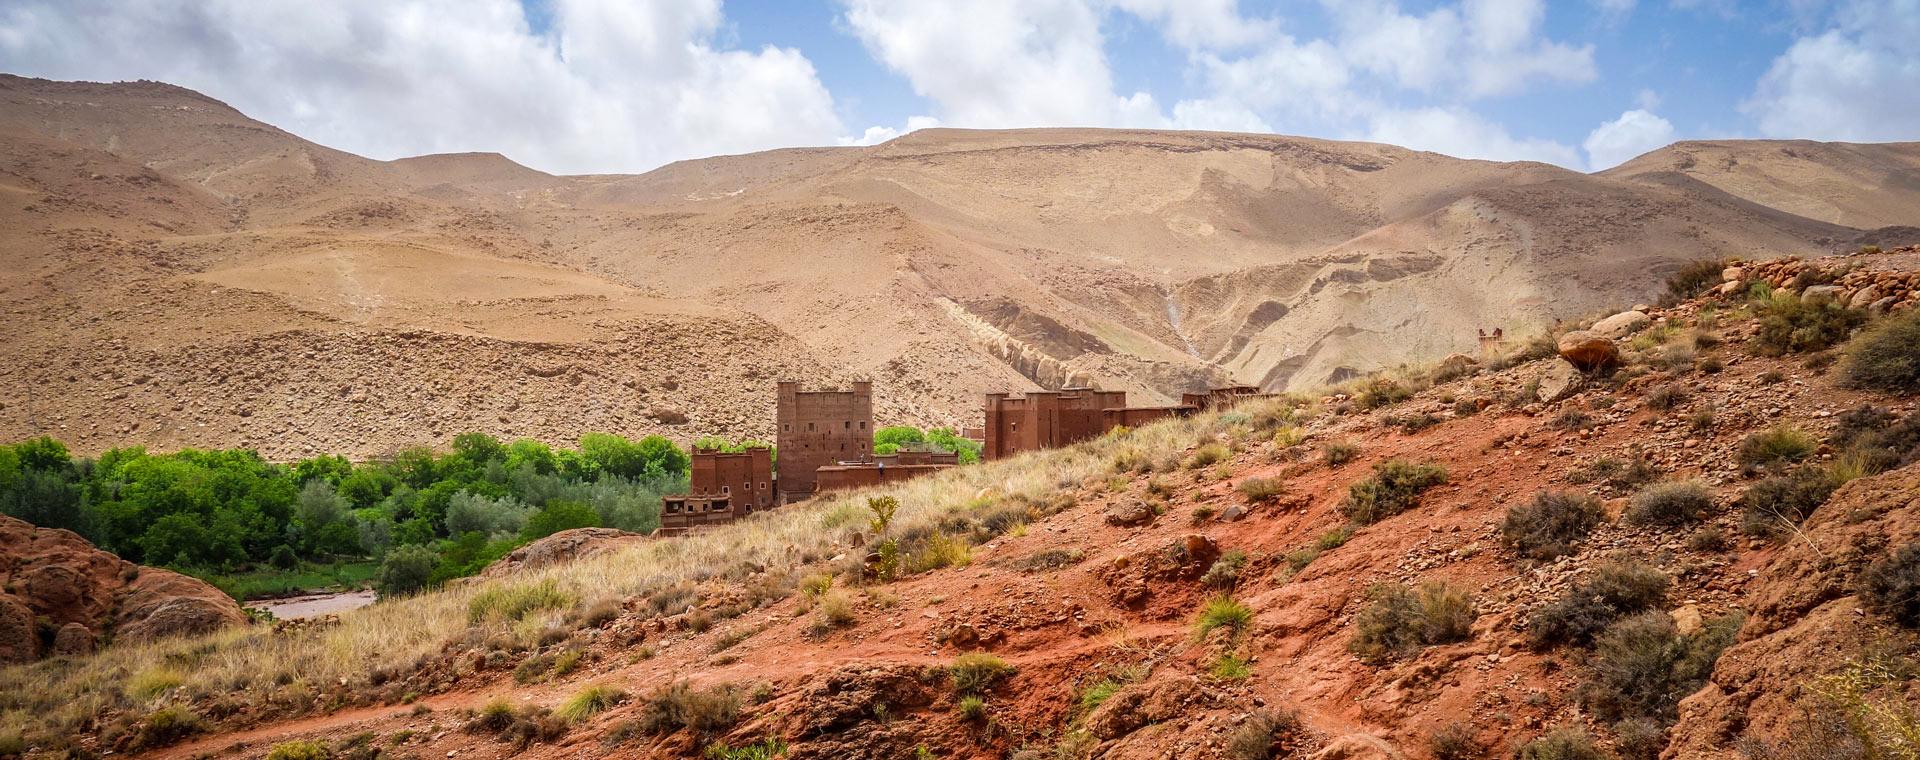 Image Vallée des roses et kasbahs